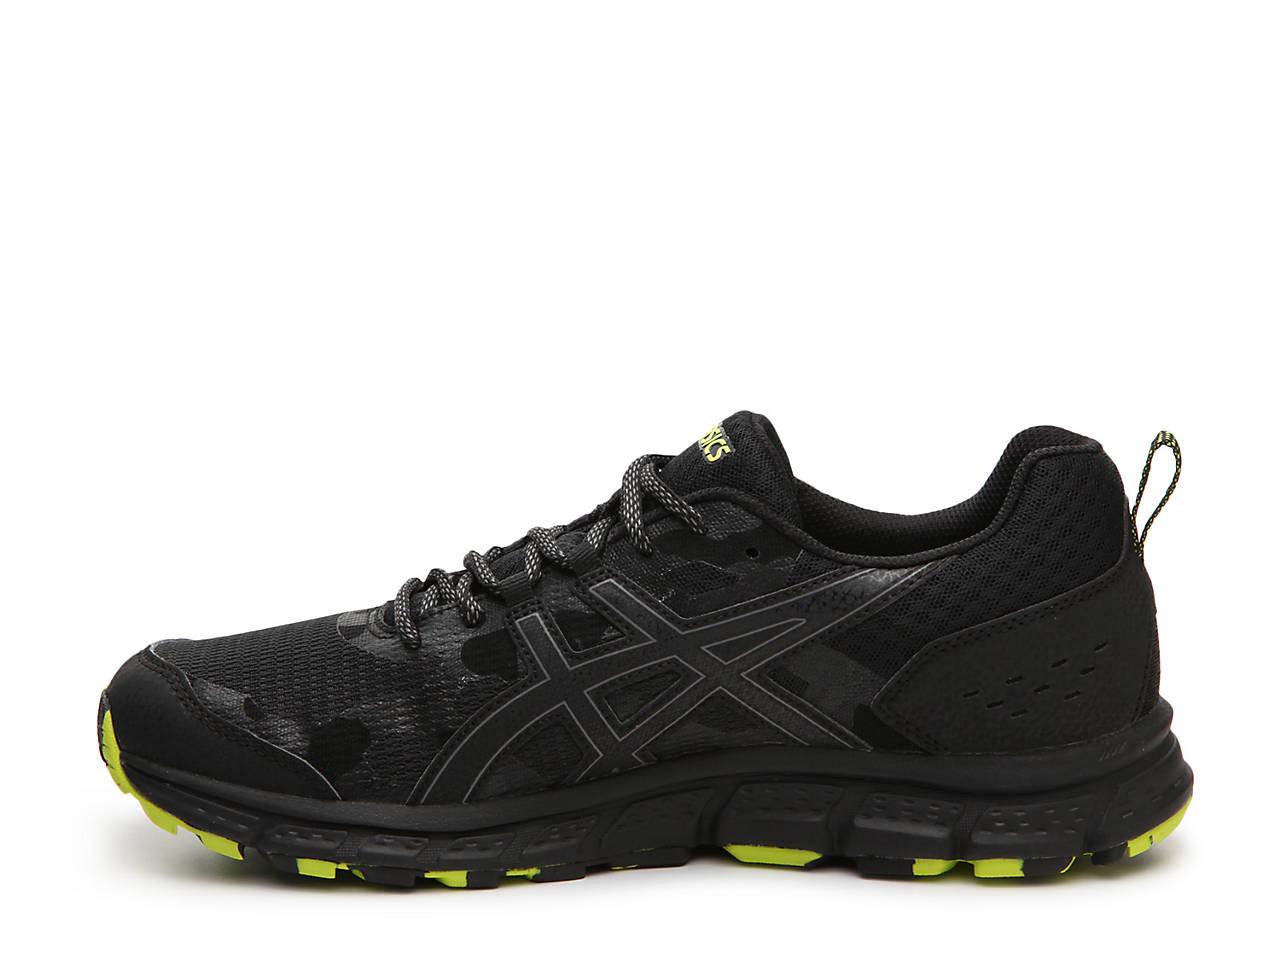 outlet store 488aa 2f00a GEL-Scram 4 Trail Running Shoe - Men's